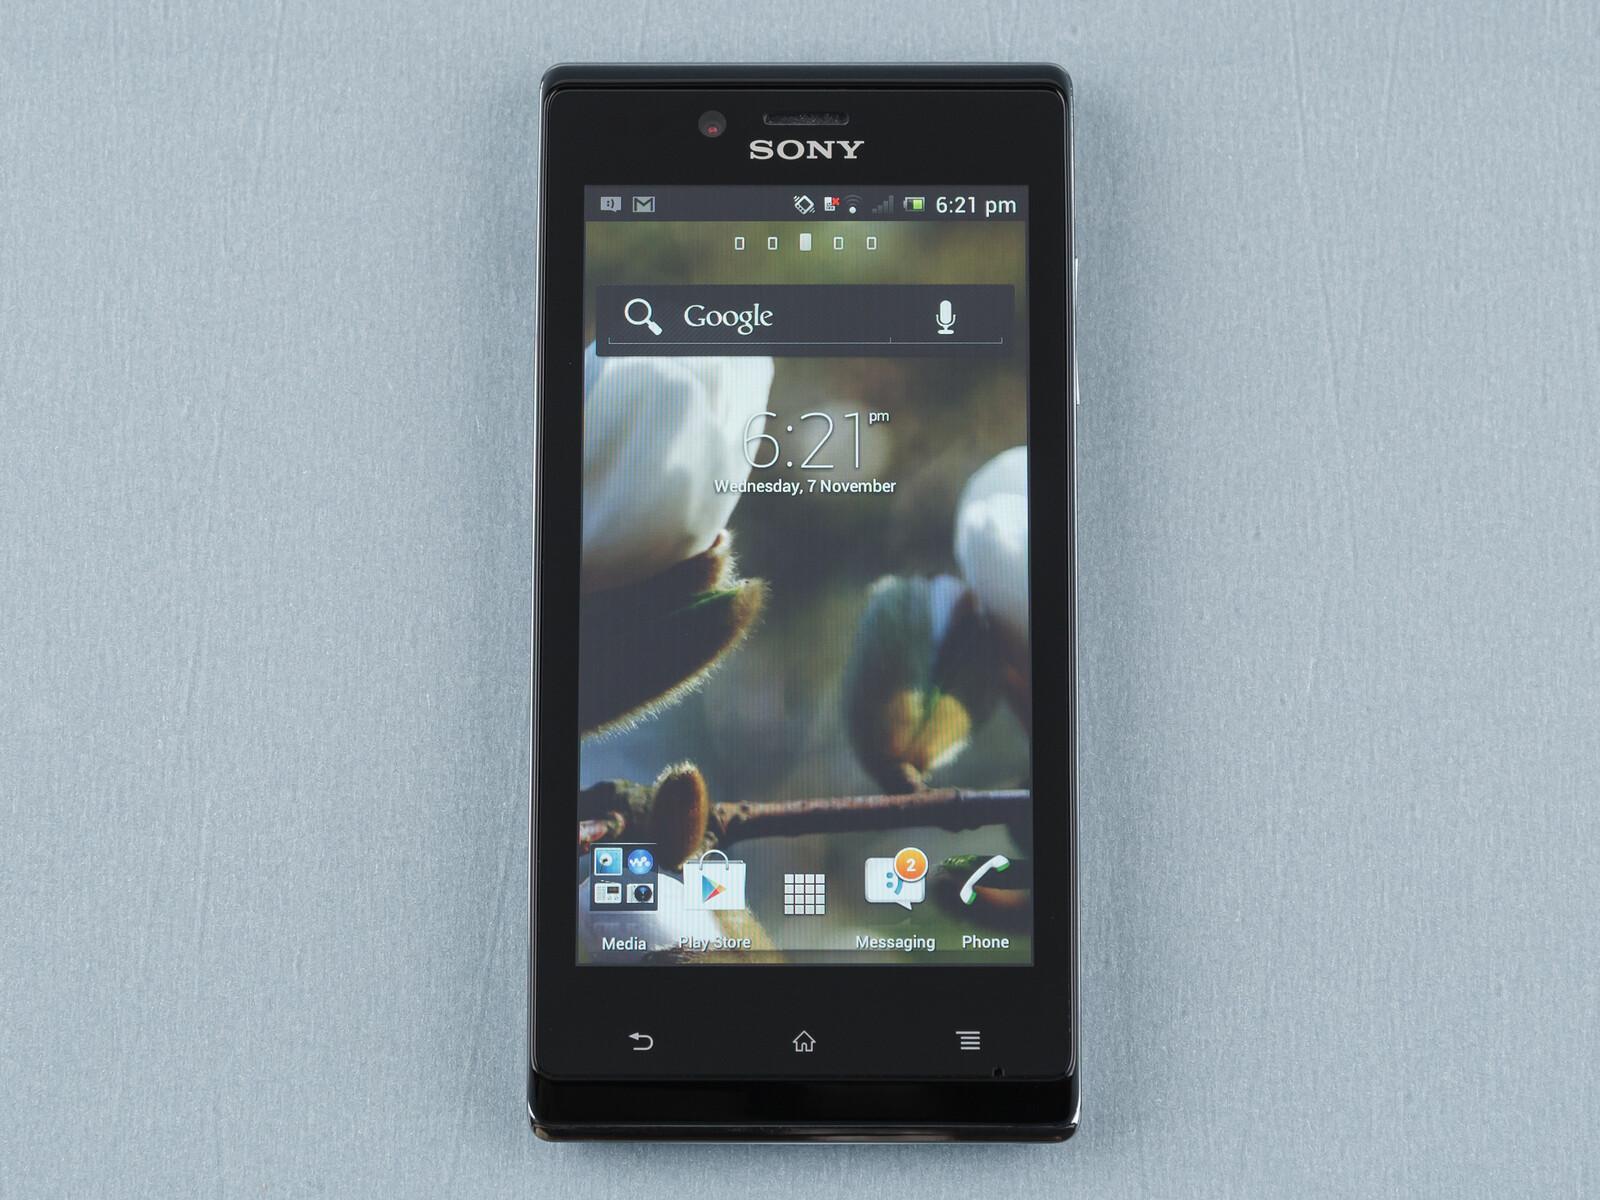 sony xperia j photos rh phonearena com Sony Ericsson Xperia Neo-V Sony Xperia X